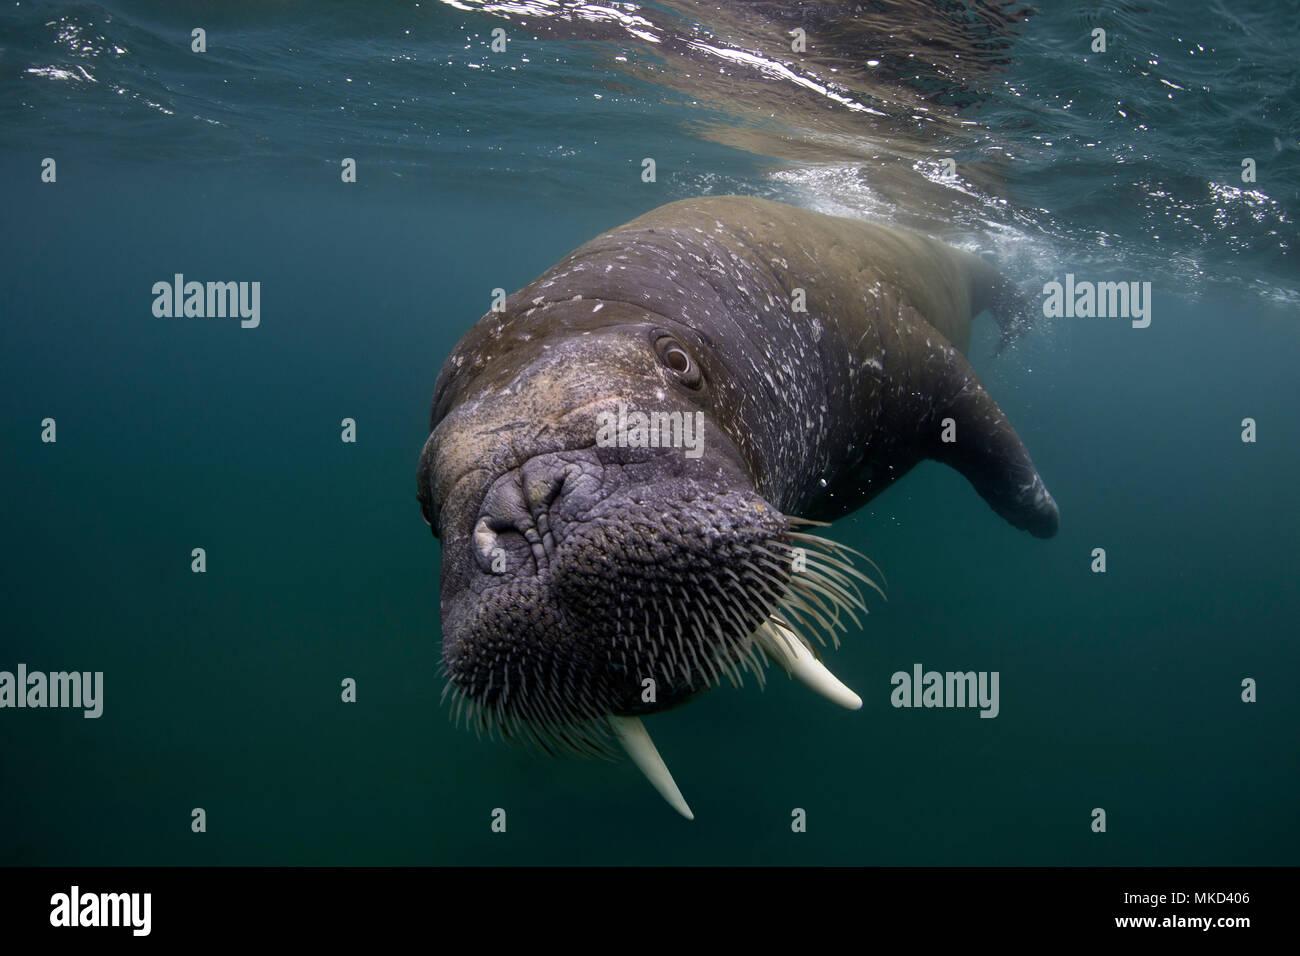 Atlantic walrus (Odobenus rosmarus), Spitsbergen, Svalbard, Norwegian archipelago, Norway, Arctic Ocean - Stock Image